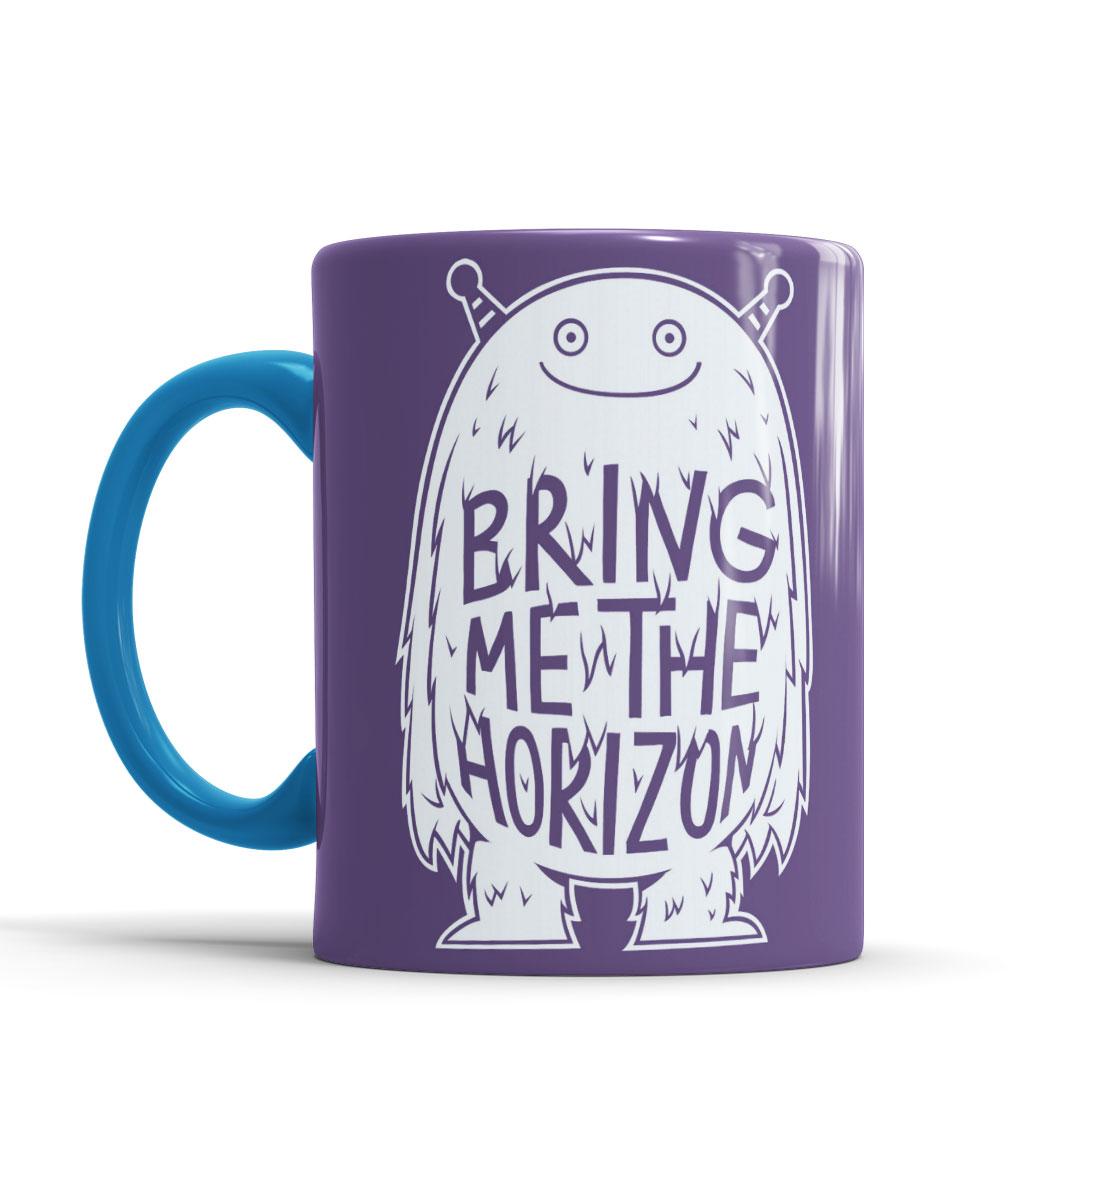 aldxc32 me 710 miynon automatic coffee grinding machine 2014 me 710 medium black Bring Me The Horizon